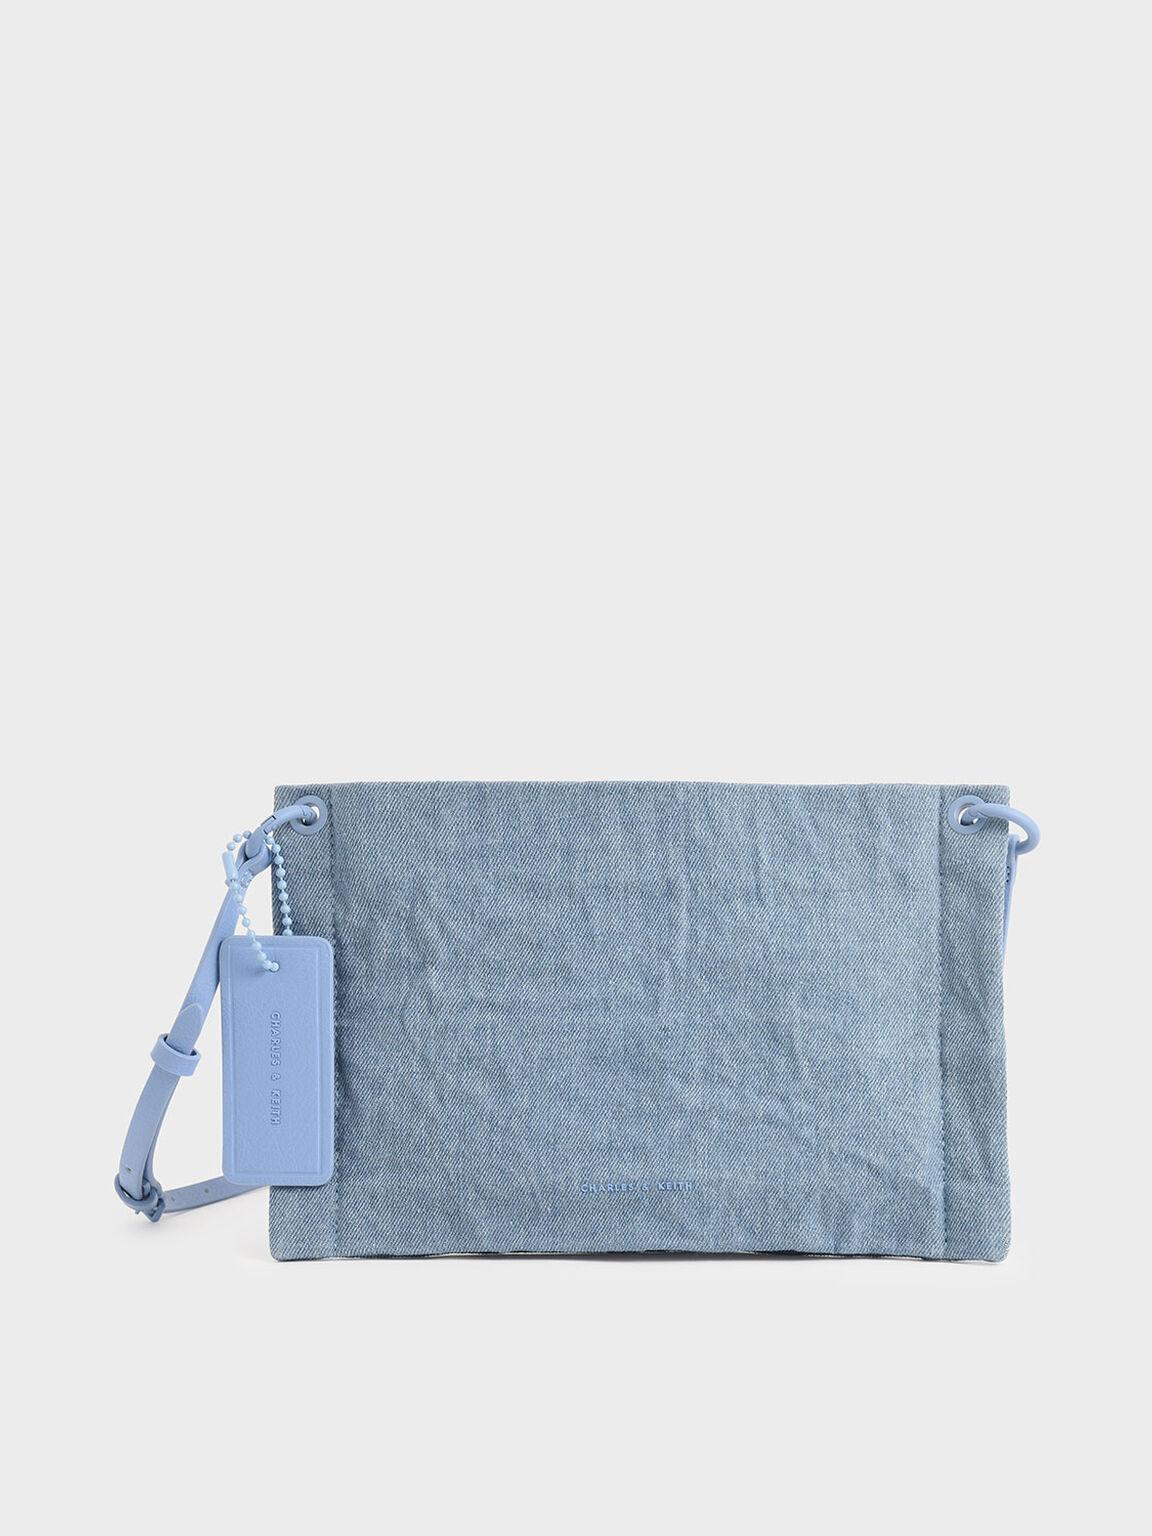 Textured Zip Clutch, Denim Blue, hi-res